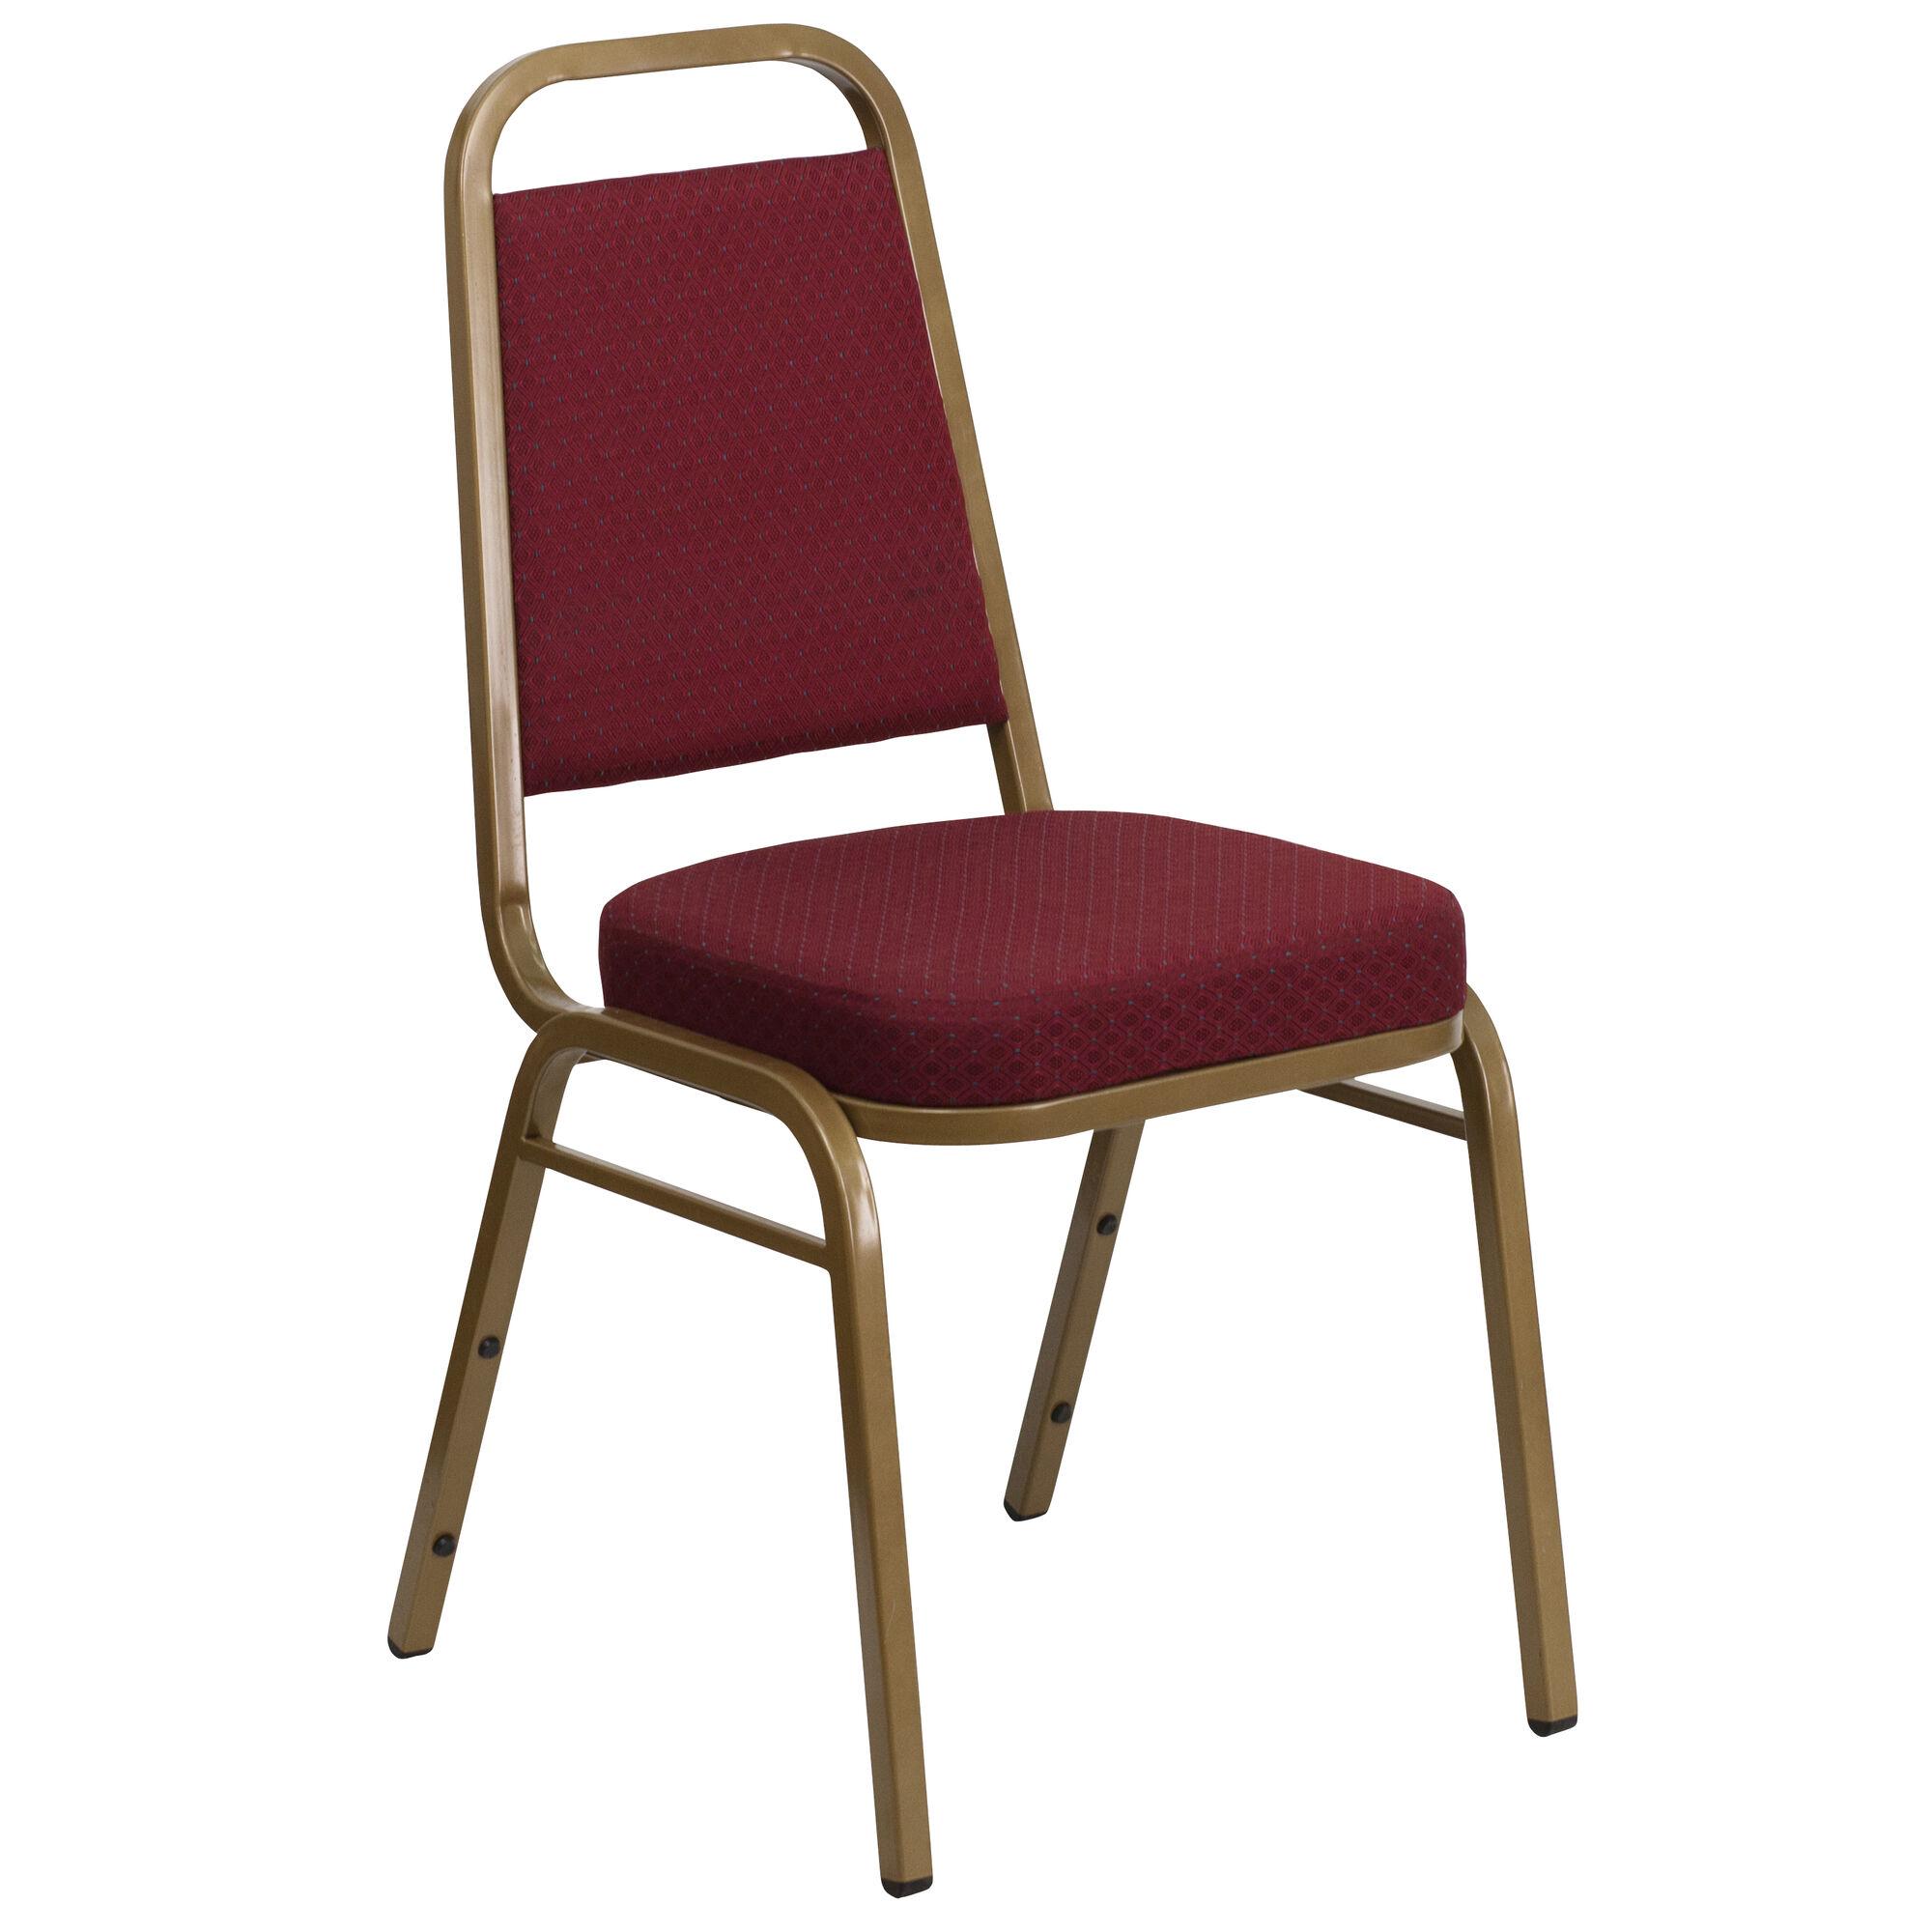 Burgundy Fabric Banquet Chair Fd Bhf 1 Allgold 0847 By Gg